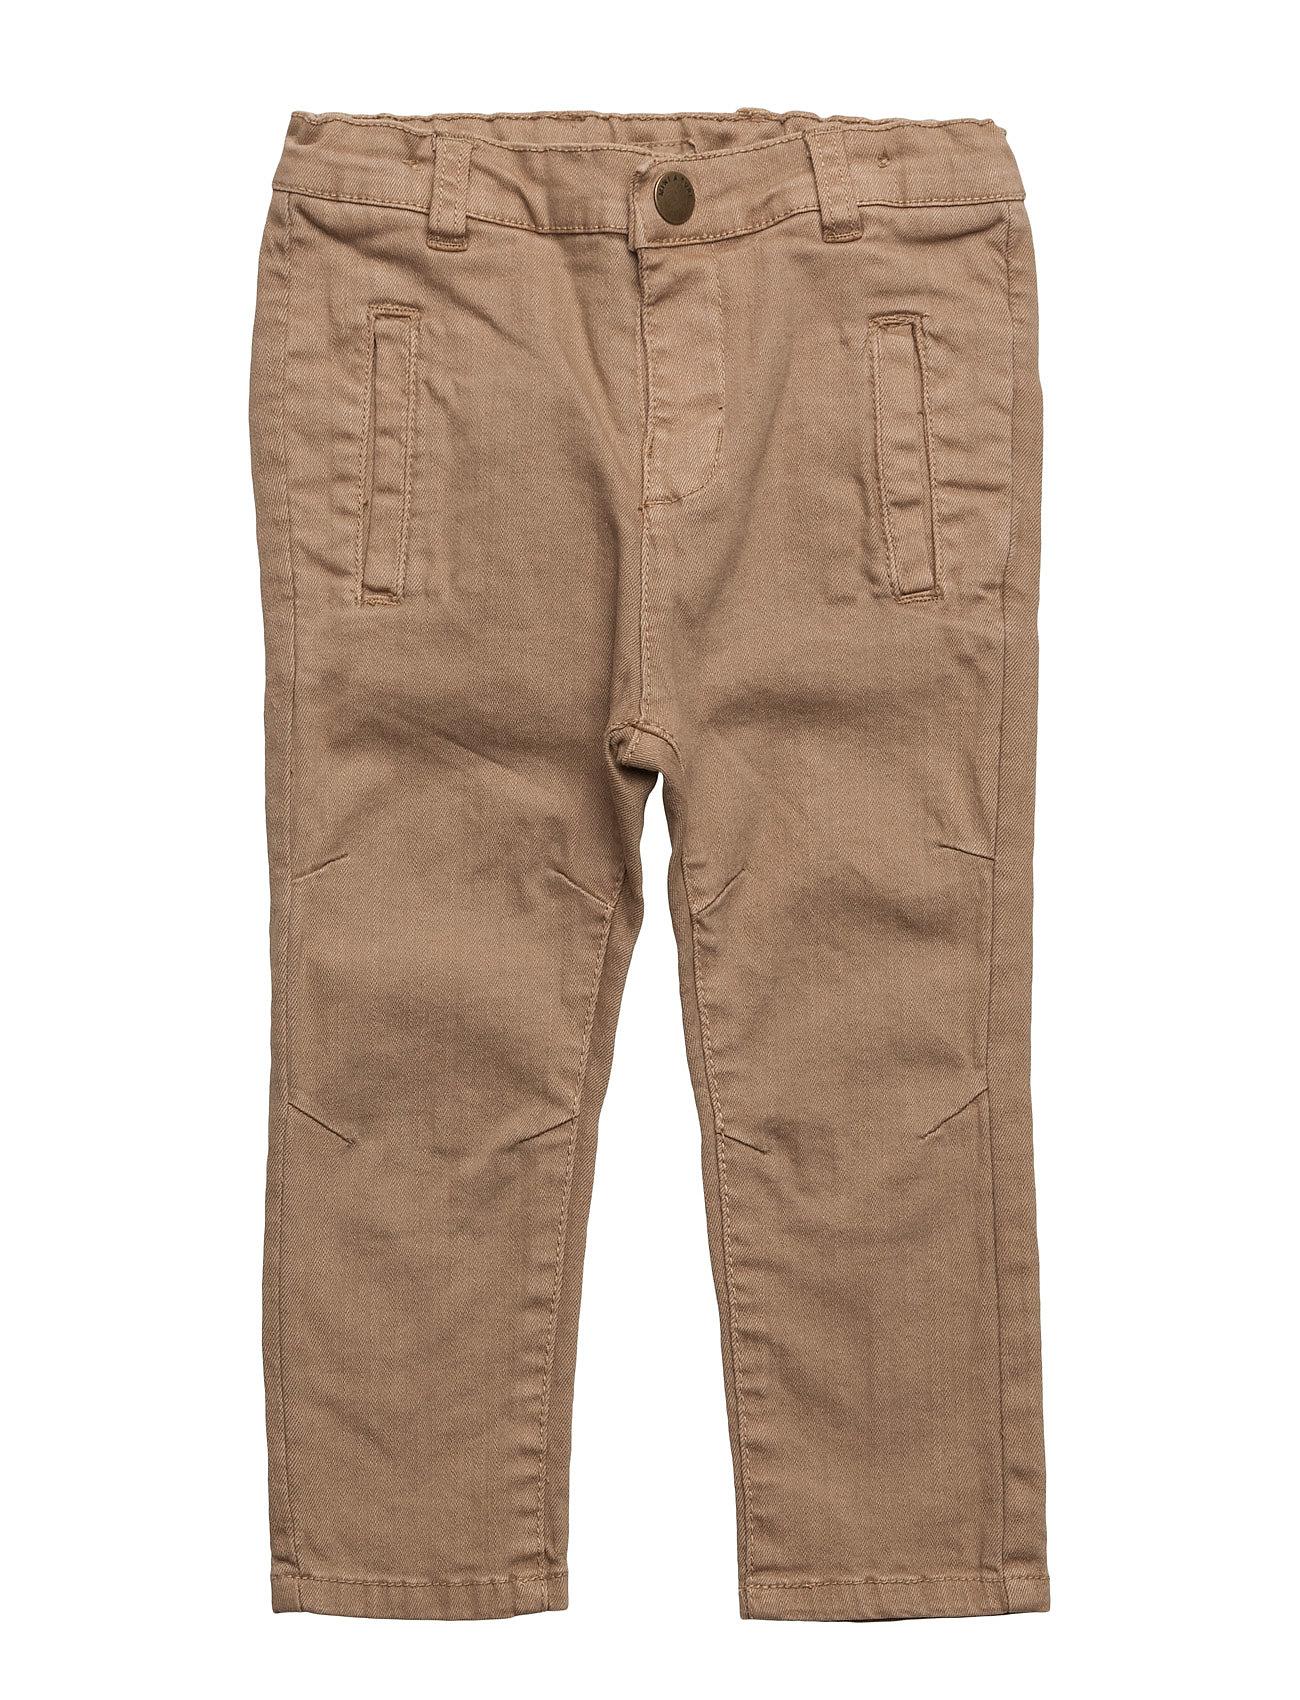 Mini A Ture Cornelius, M Pants